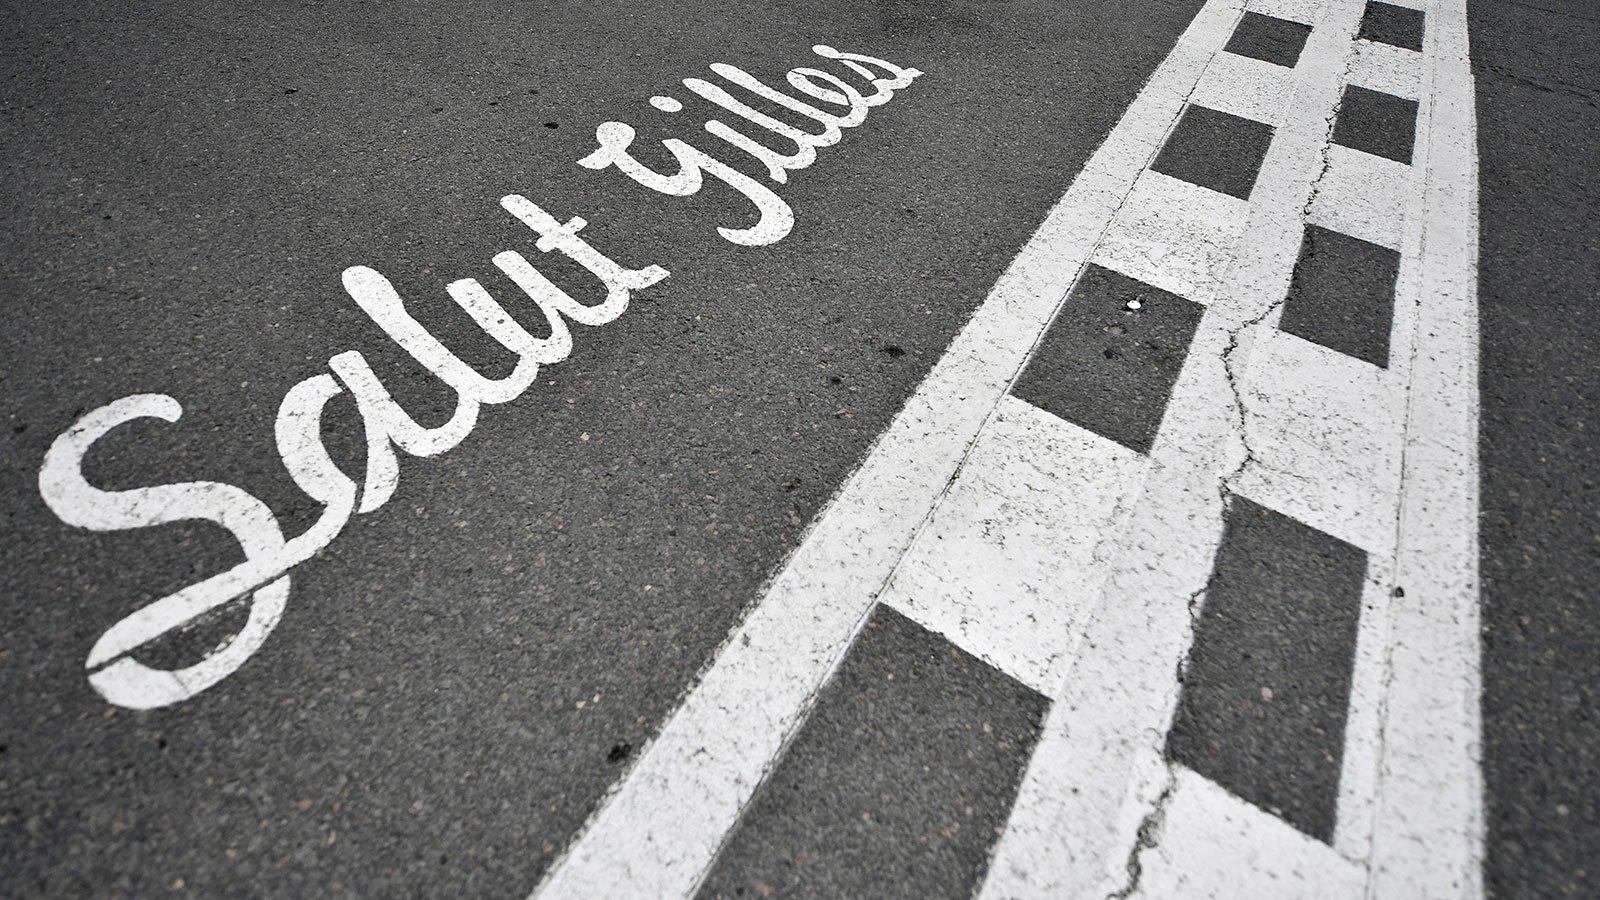 Стартовая линия автодрома имени Жиля Вильнёва в Монреале